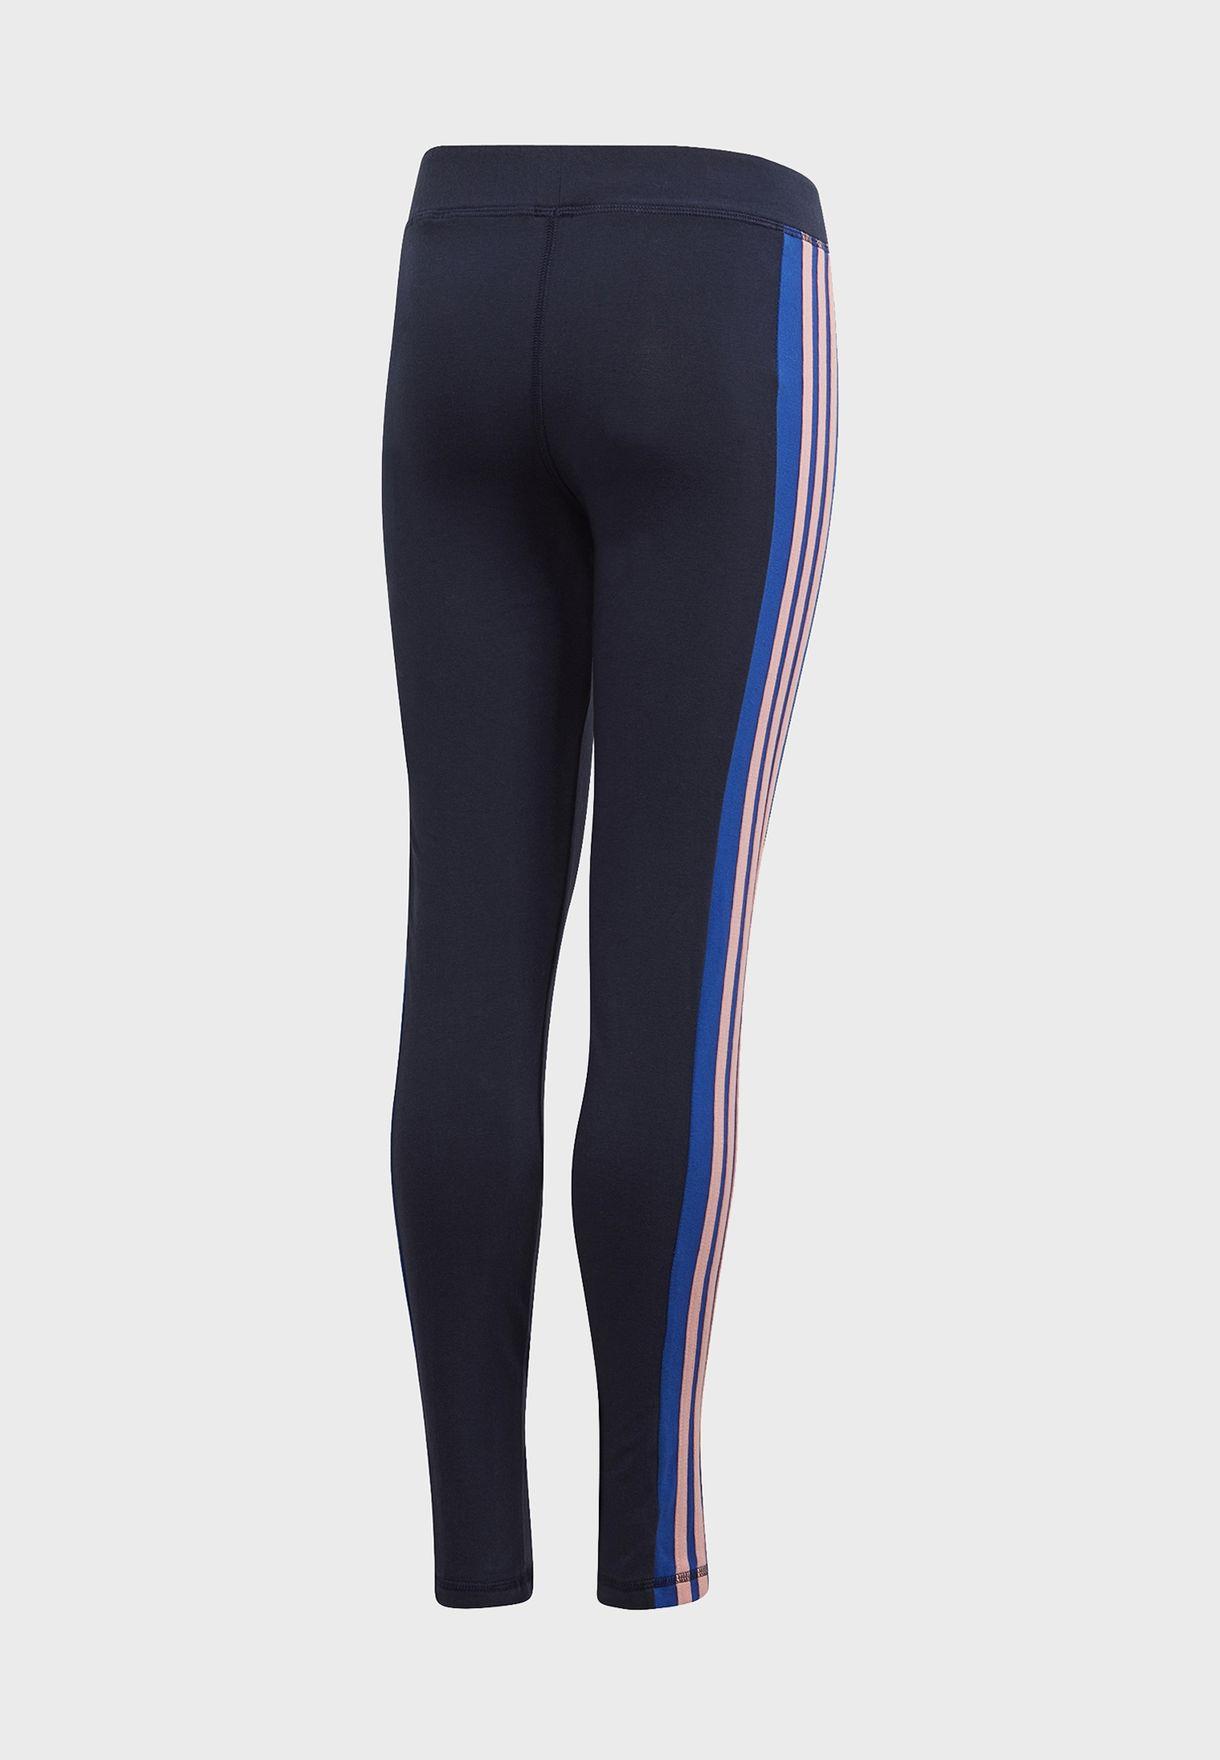 3 Stripes Essentials Sports Women's Leggings